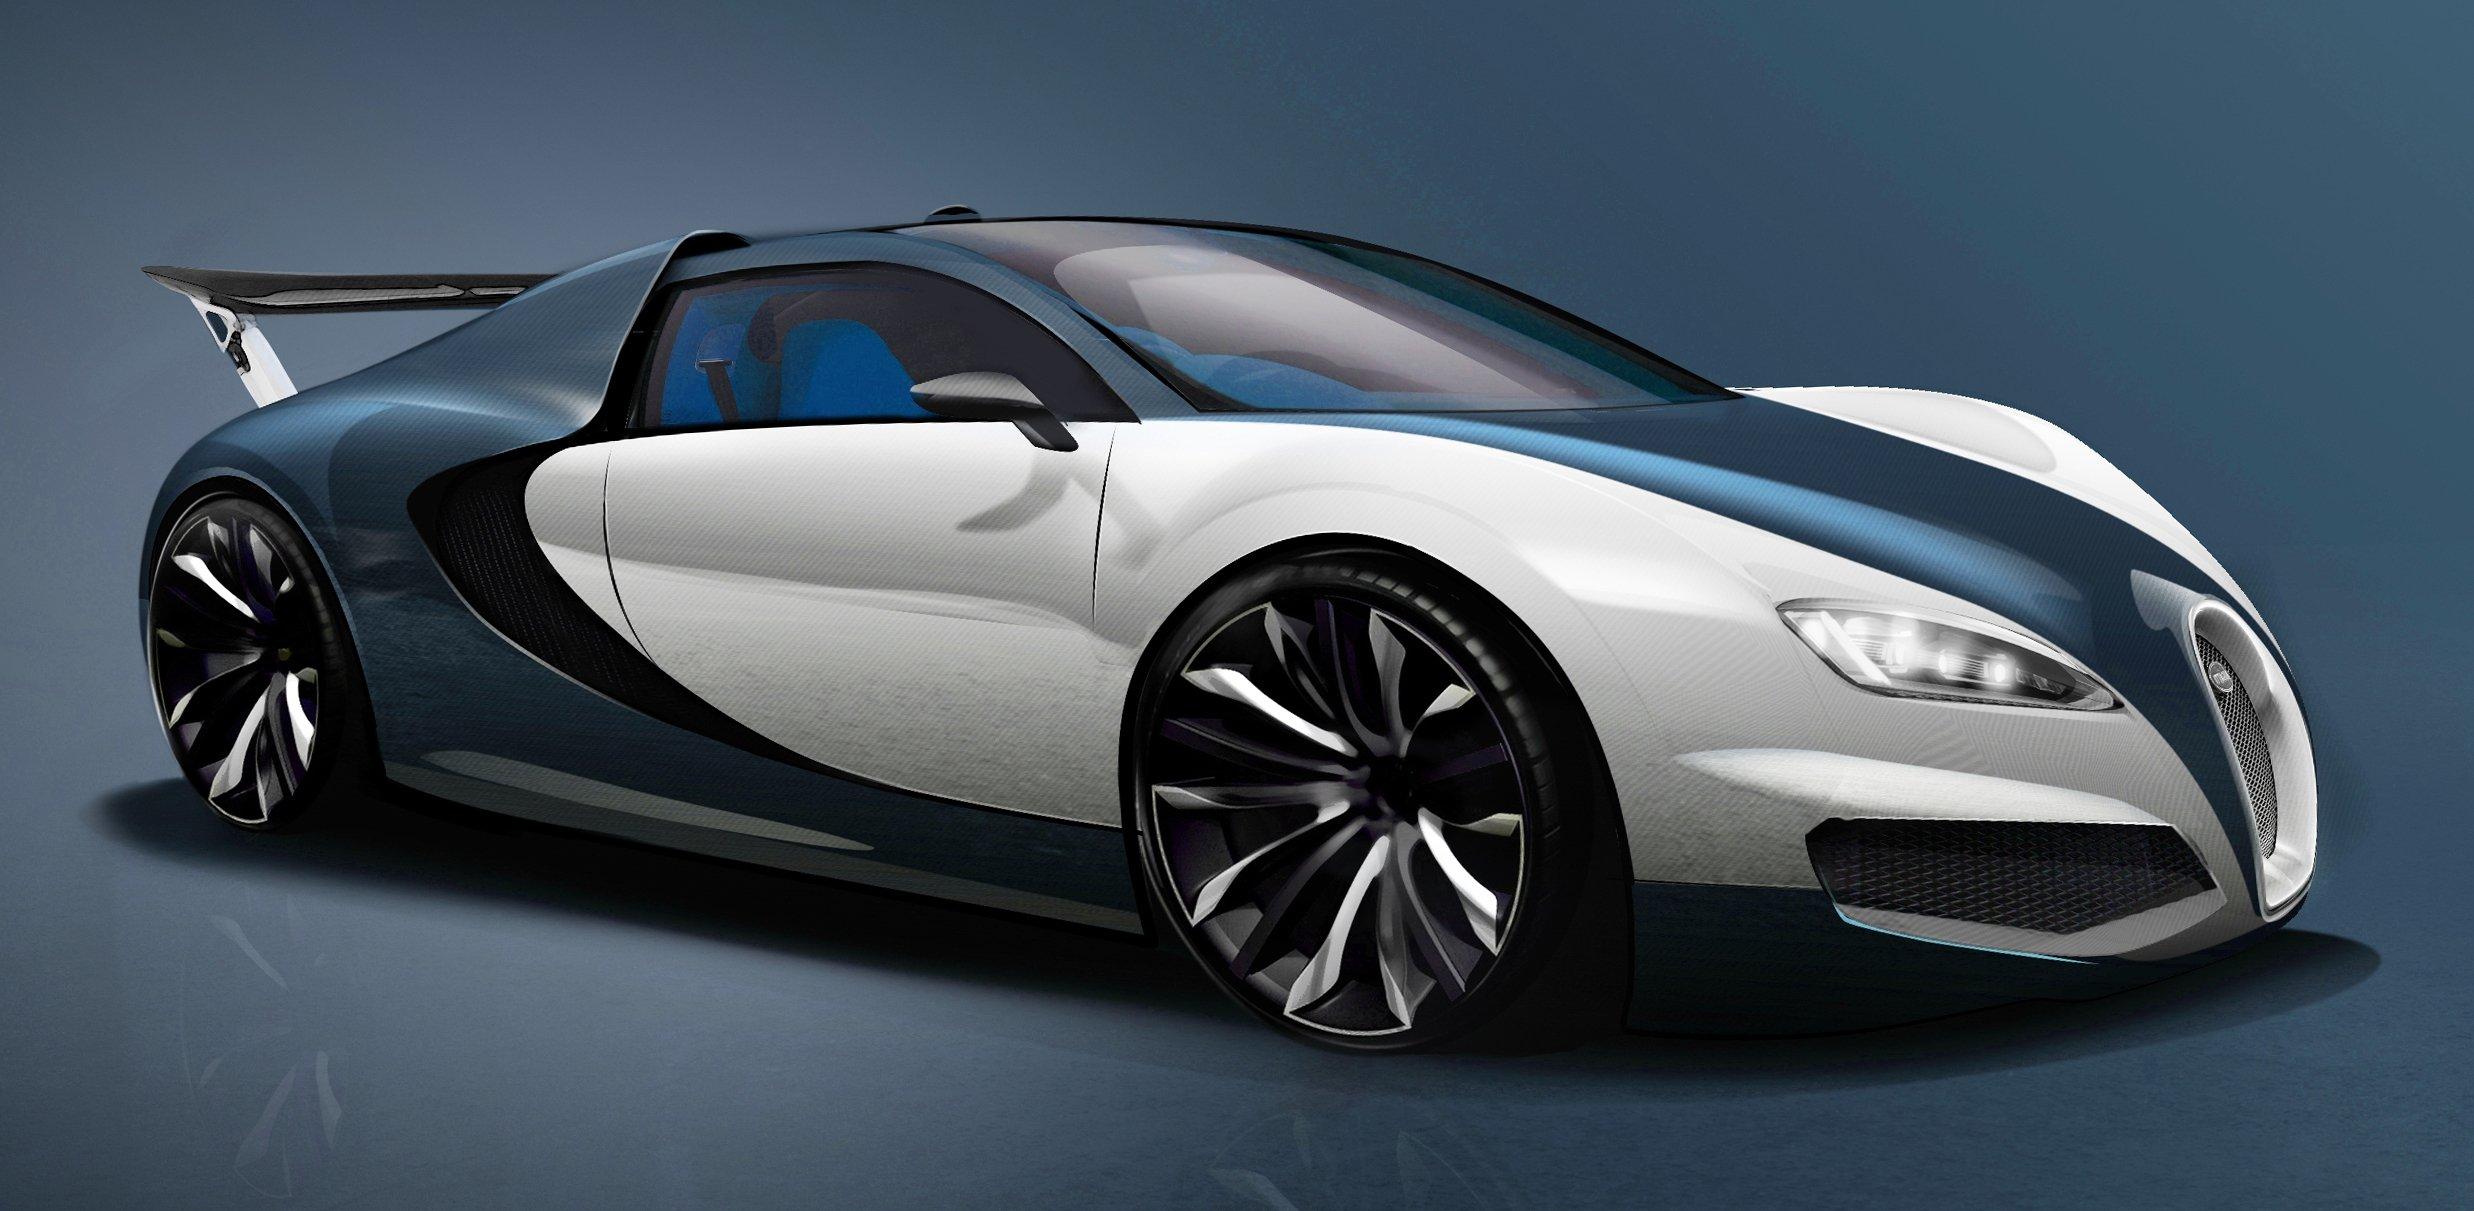 bugatti veyron wild 1 500 hp successor due in 2016. Black Bedroom Furniture Sets. Home Design Ideas